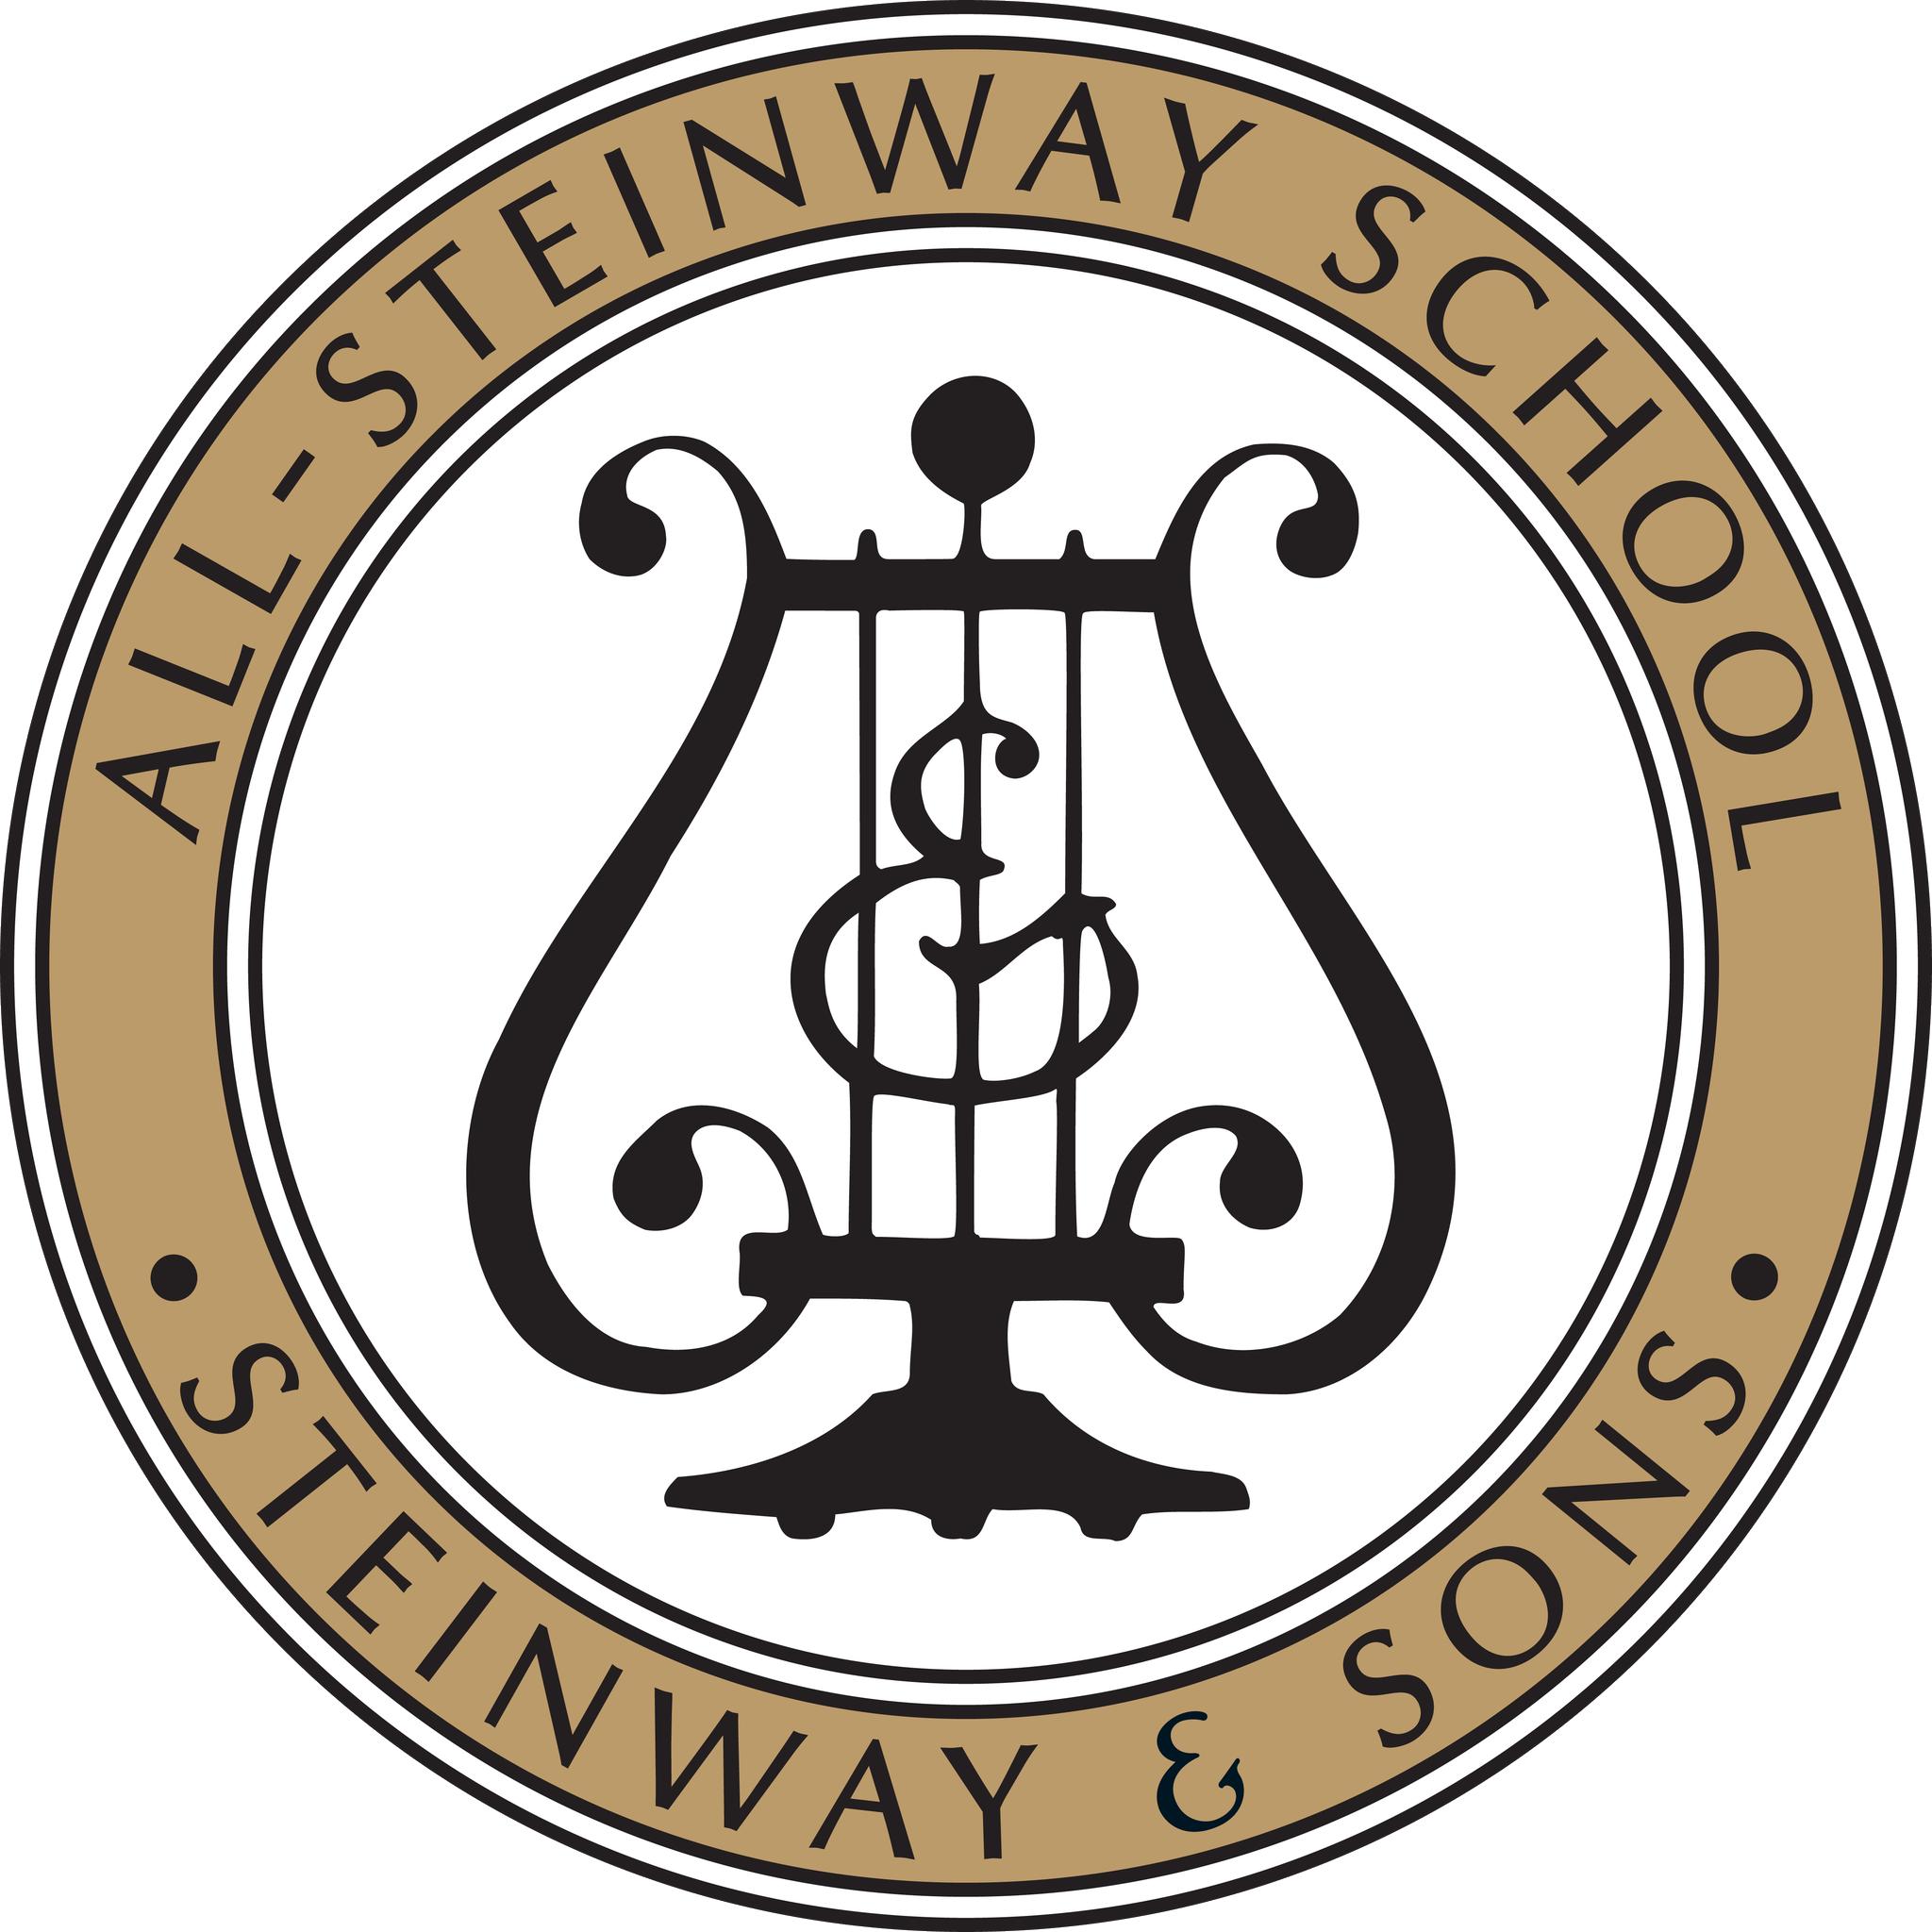 All Steinway School Badge